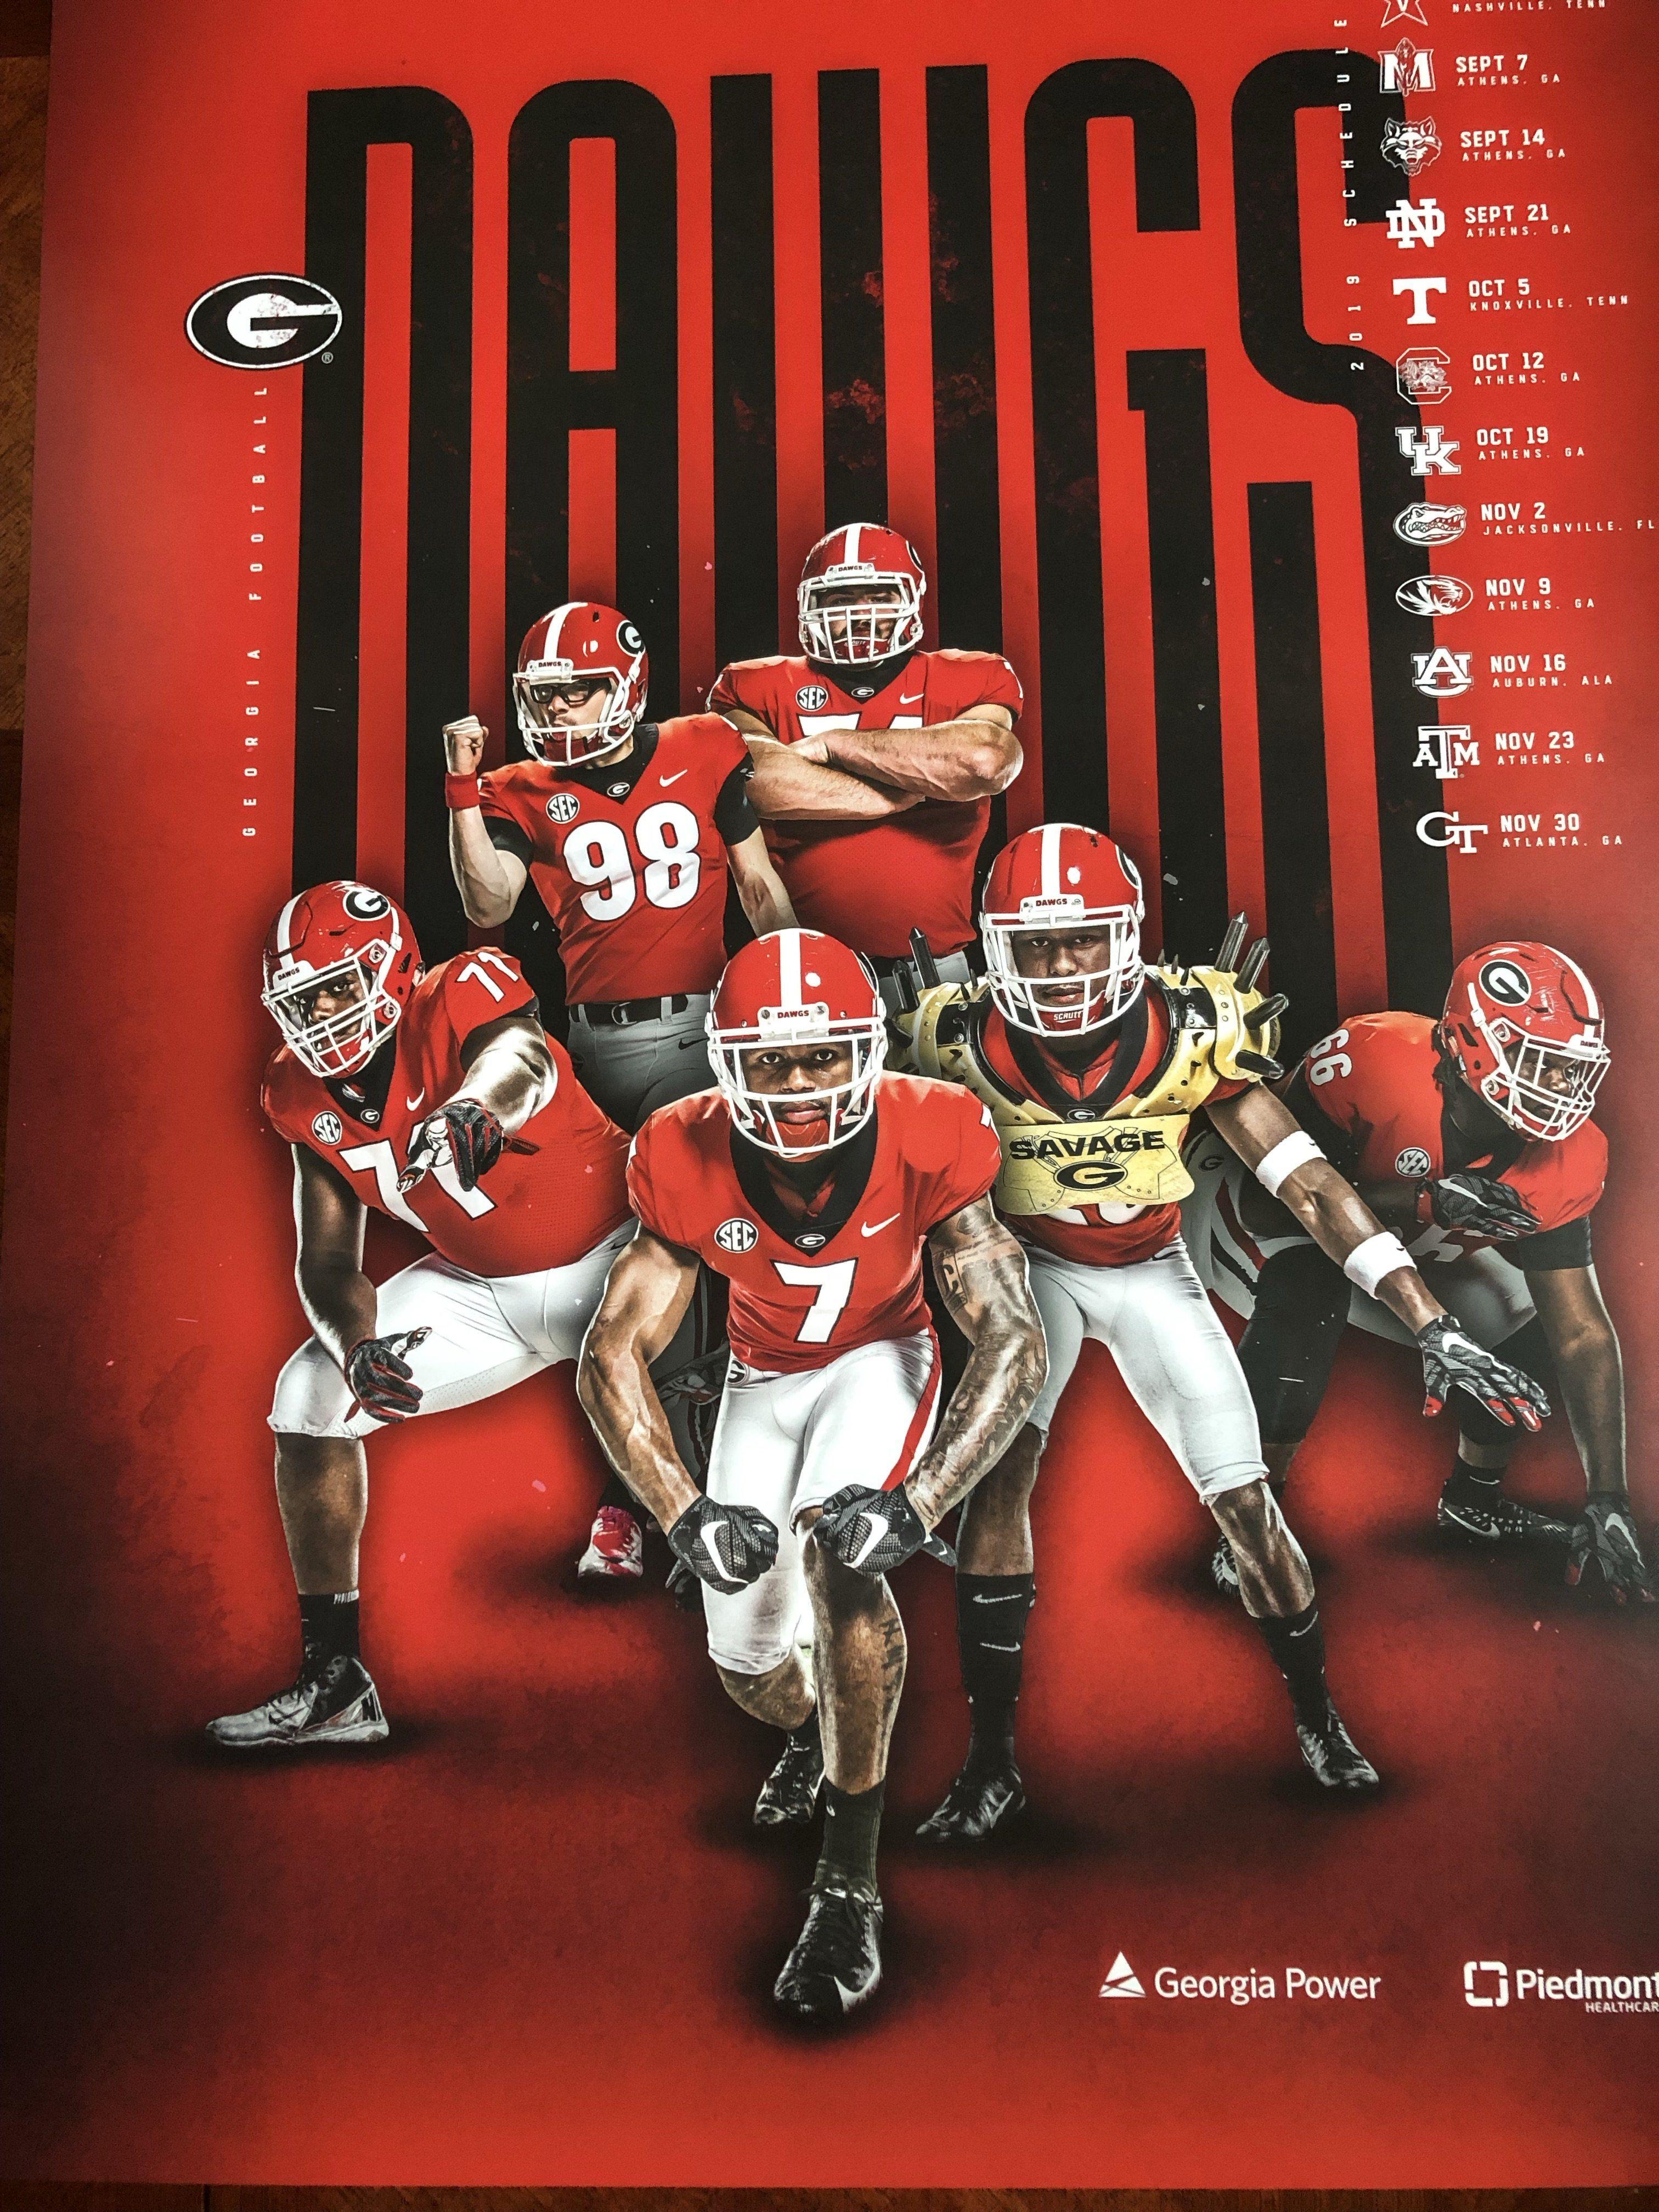 2019 Football Team Red Team Schedule Poster Team